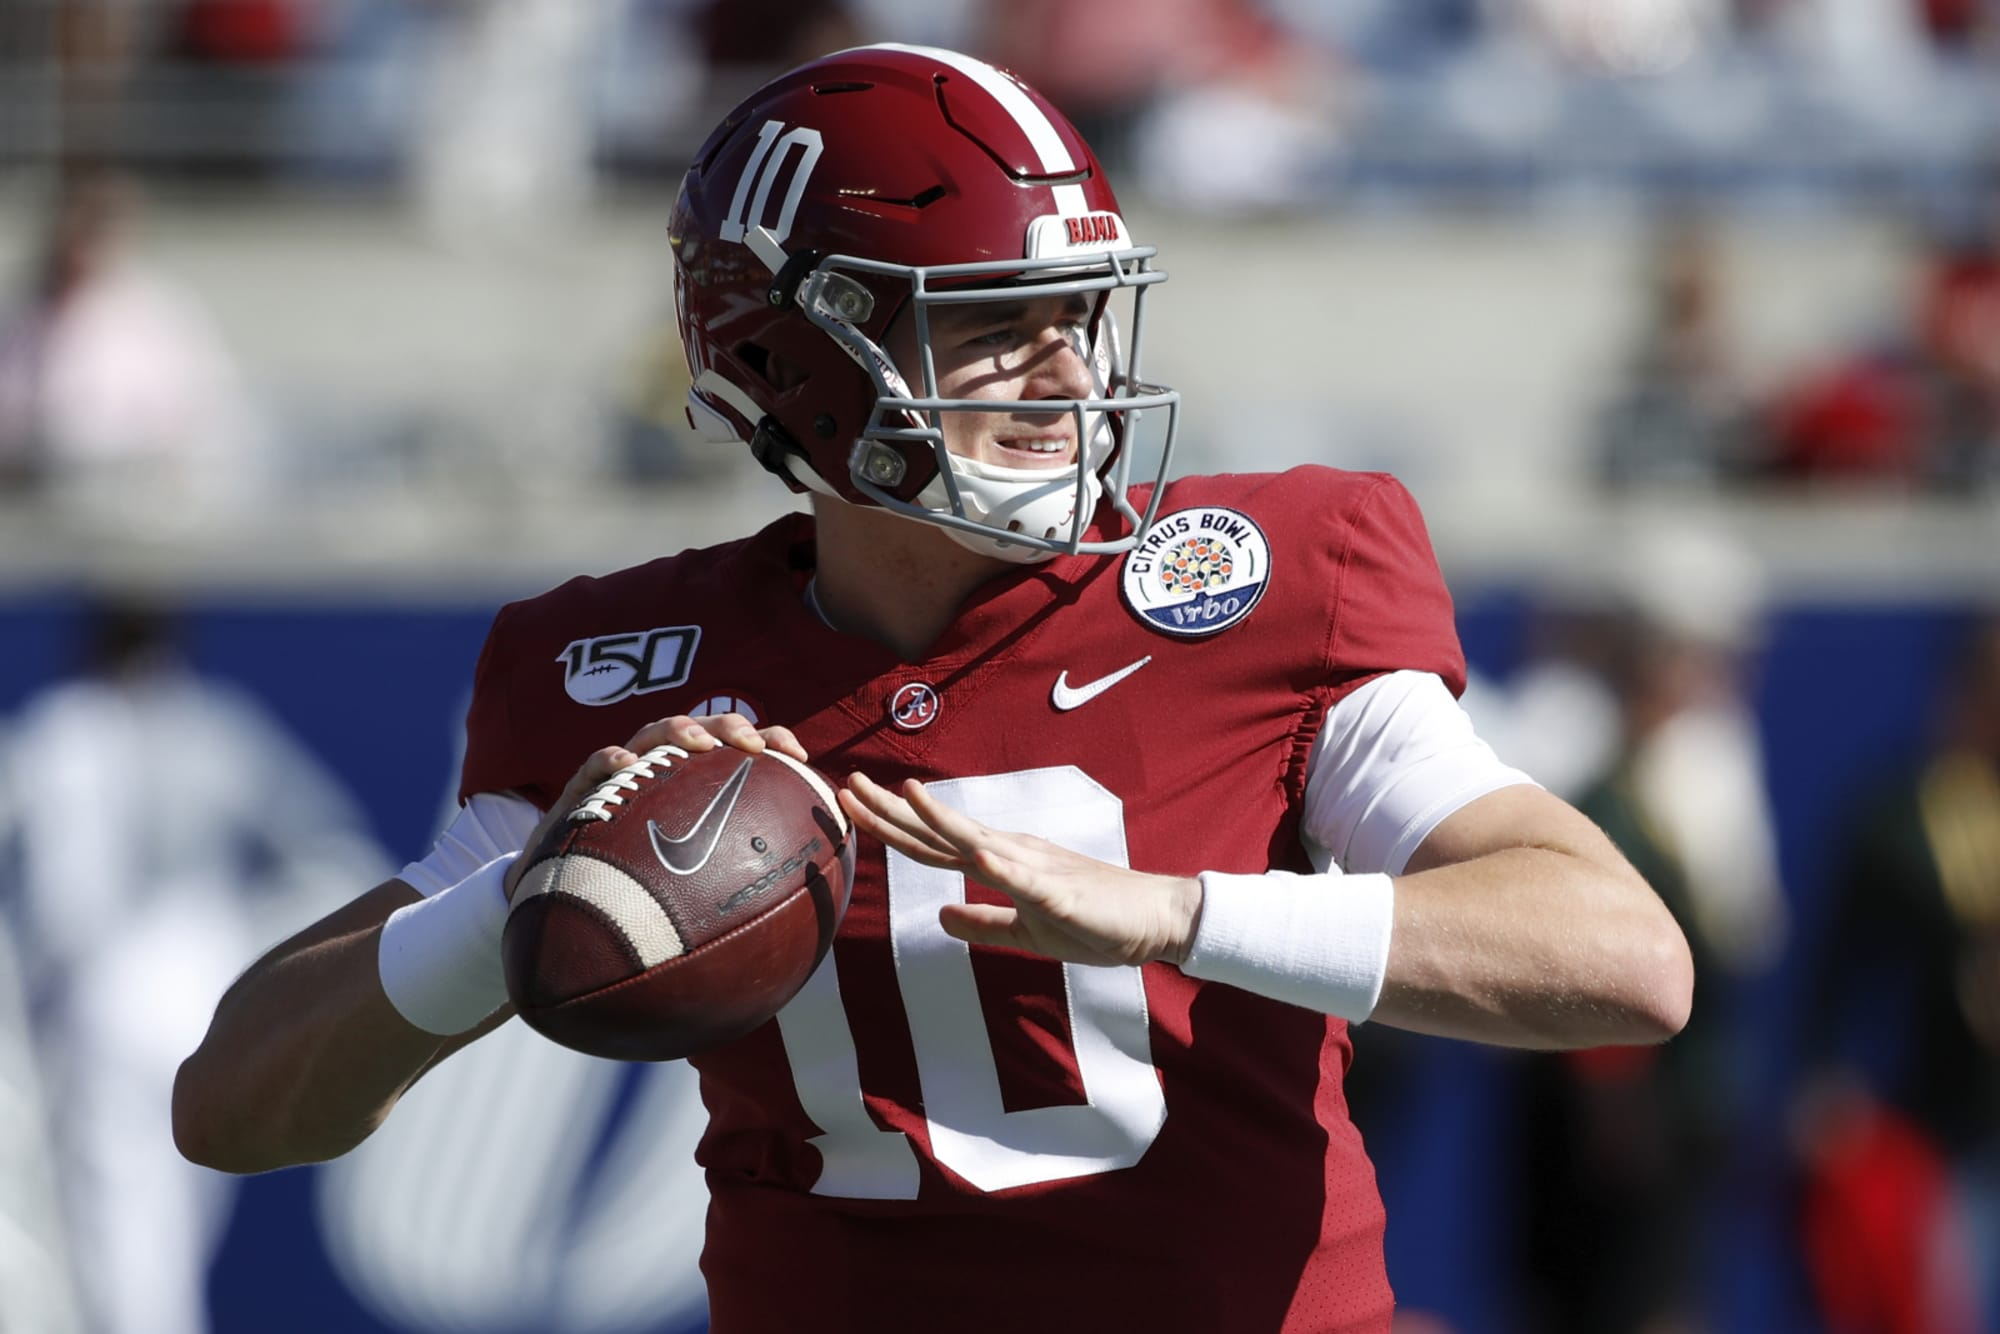 2021 NFL Draft: Alabama QB Mac Jones scouting report and his NFL fit